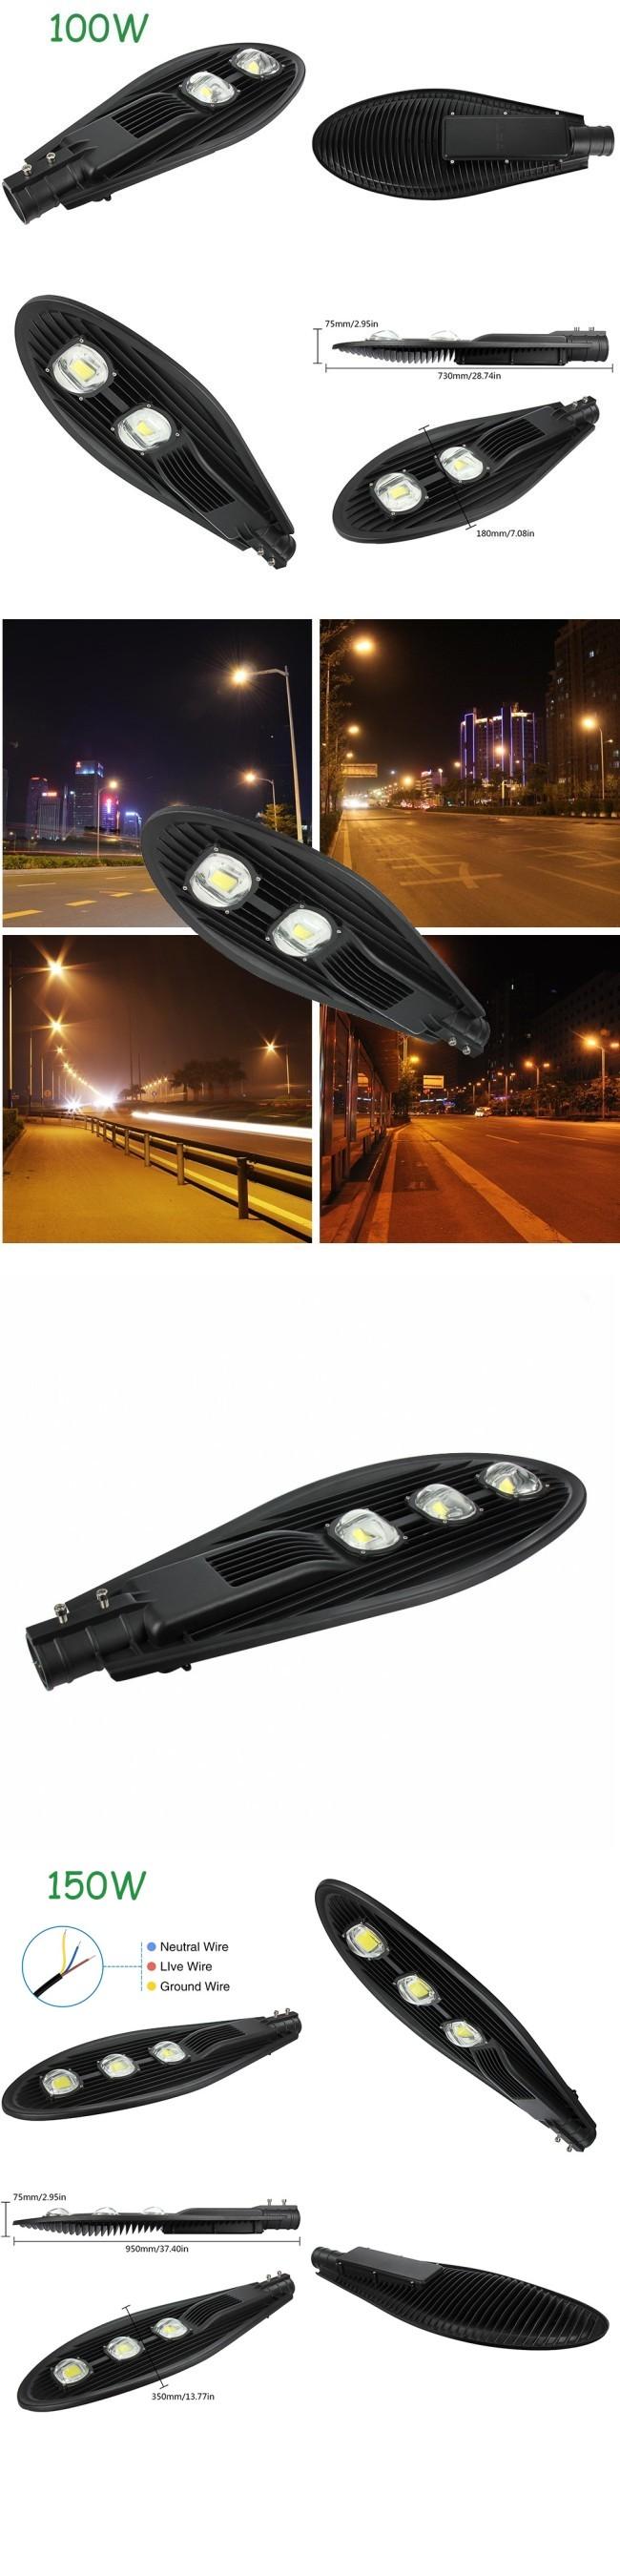 Meanwell Driver Bridgelux Epistar Chip 200W Street LED Light Outdoor Super Bright